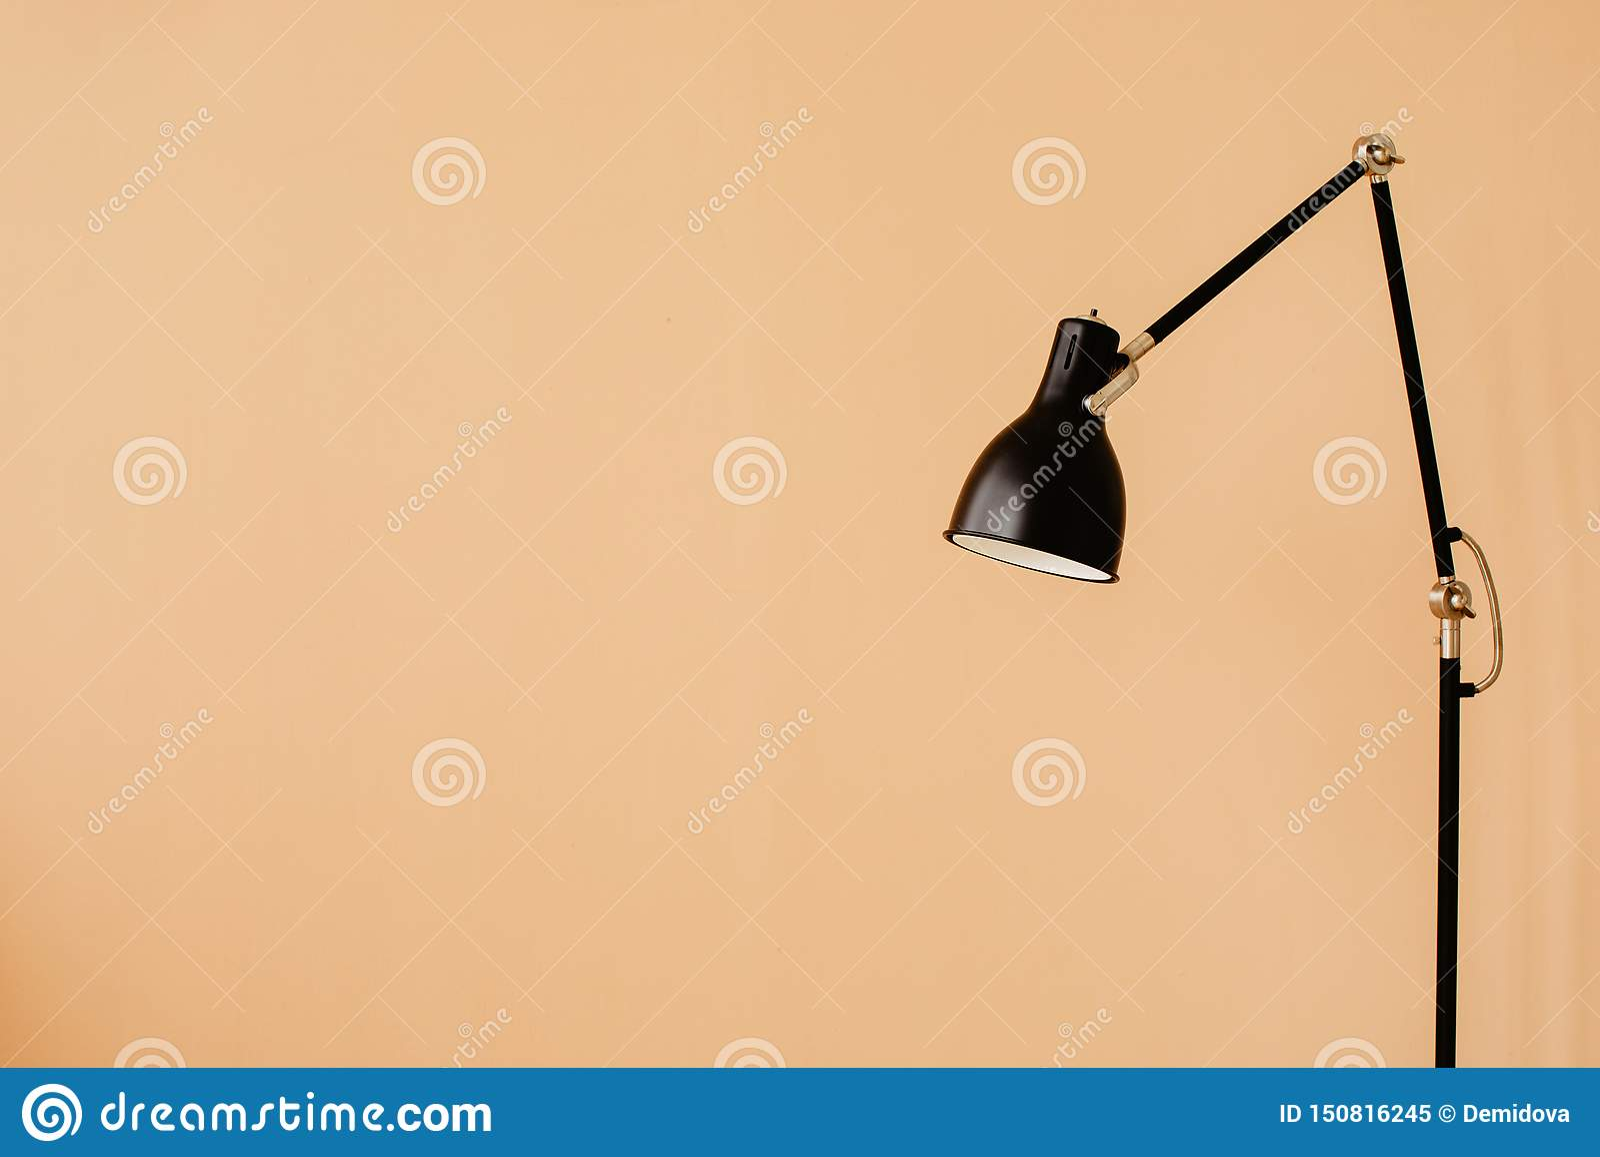 Stylish floor lamp in apartment